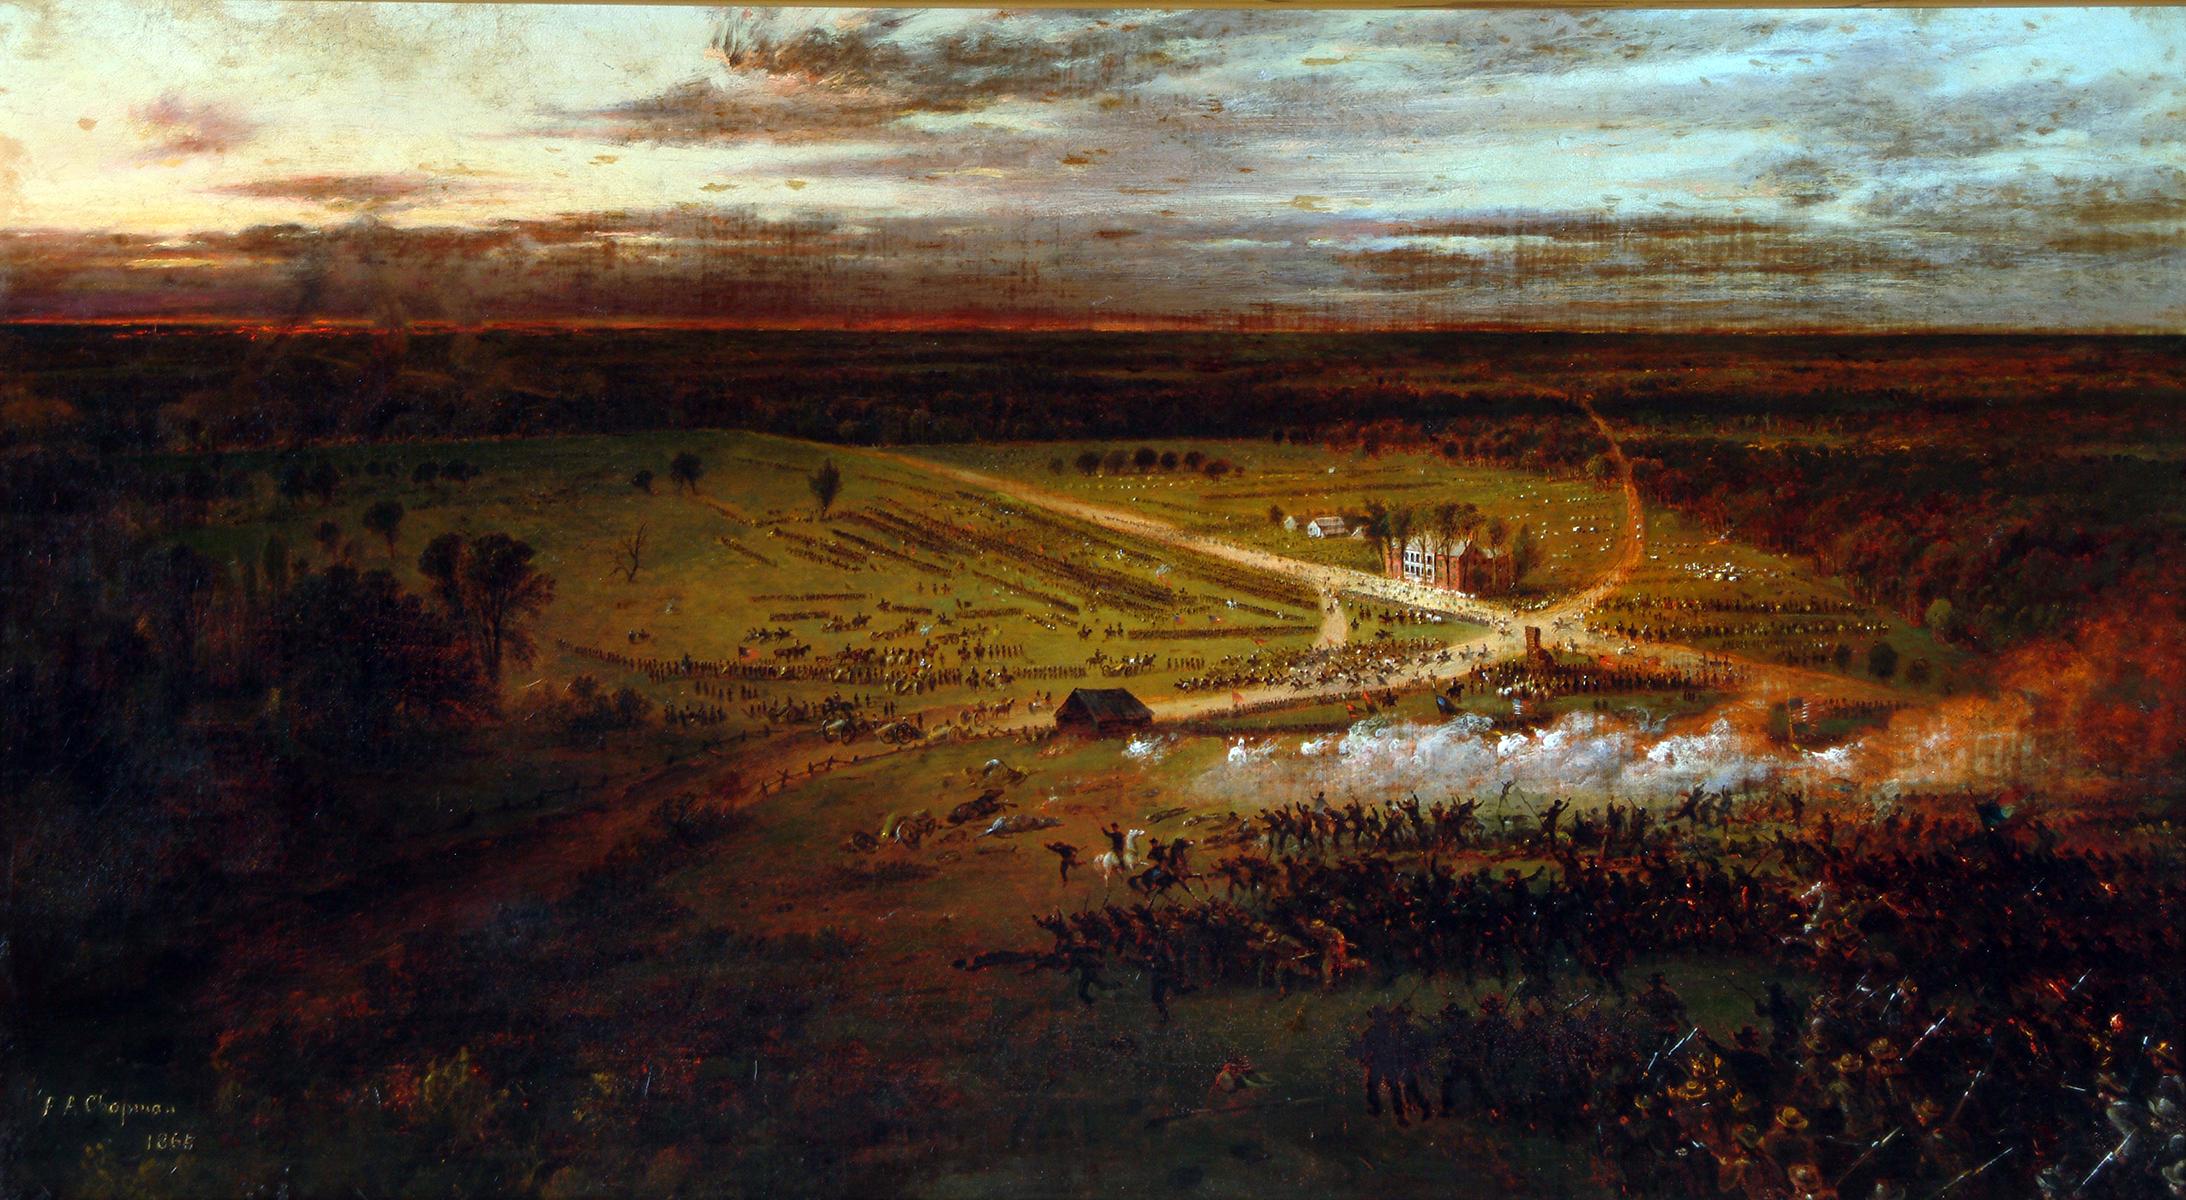 A Civil War Crossroads (May 1, 1863)